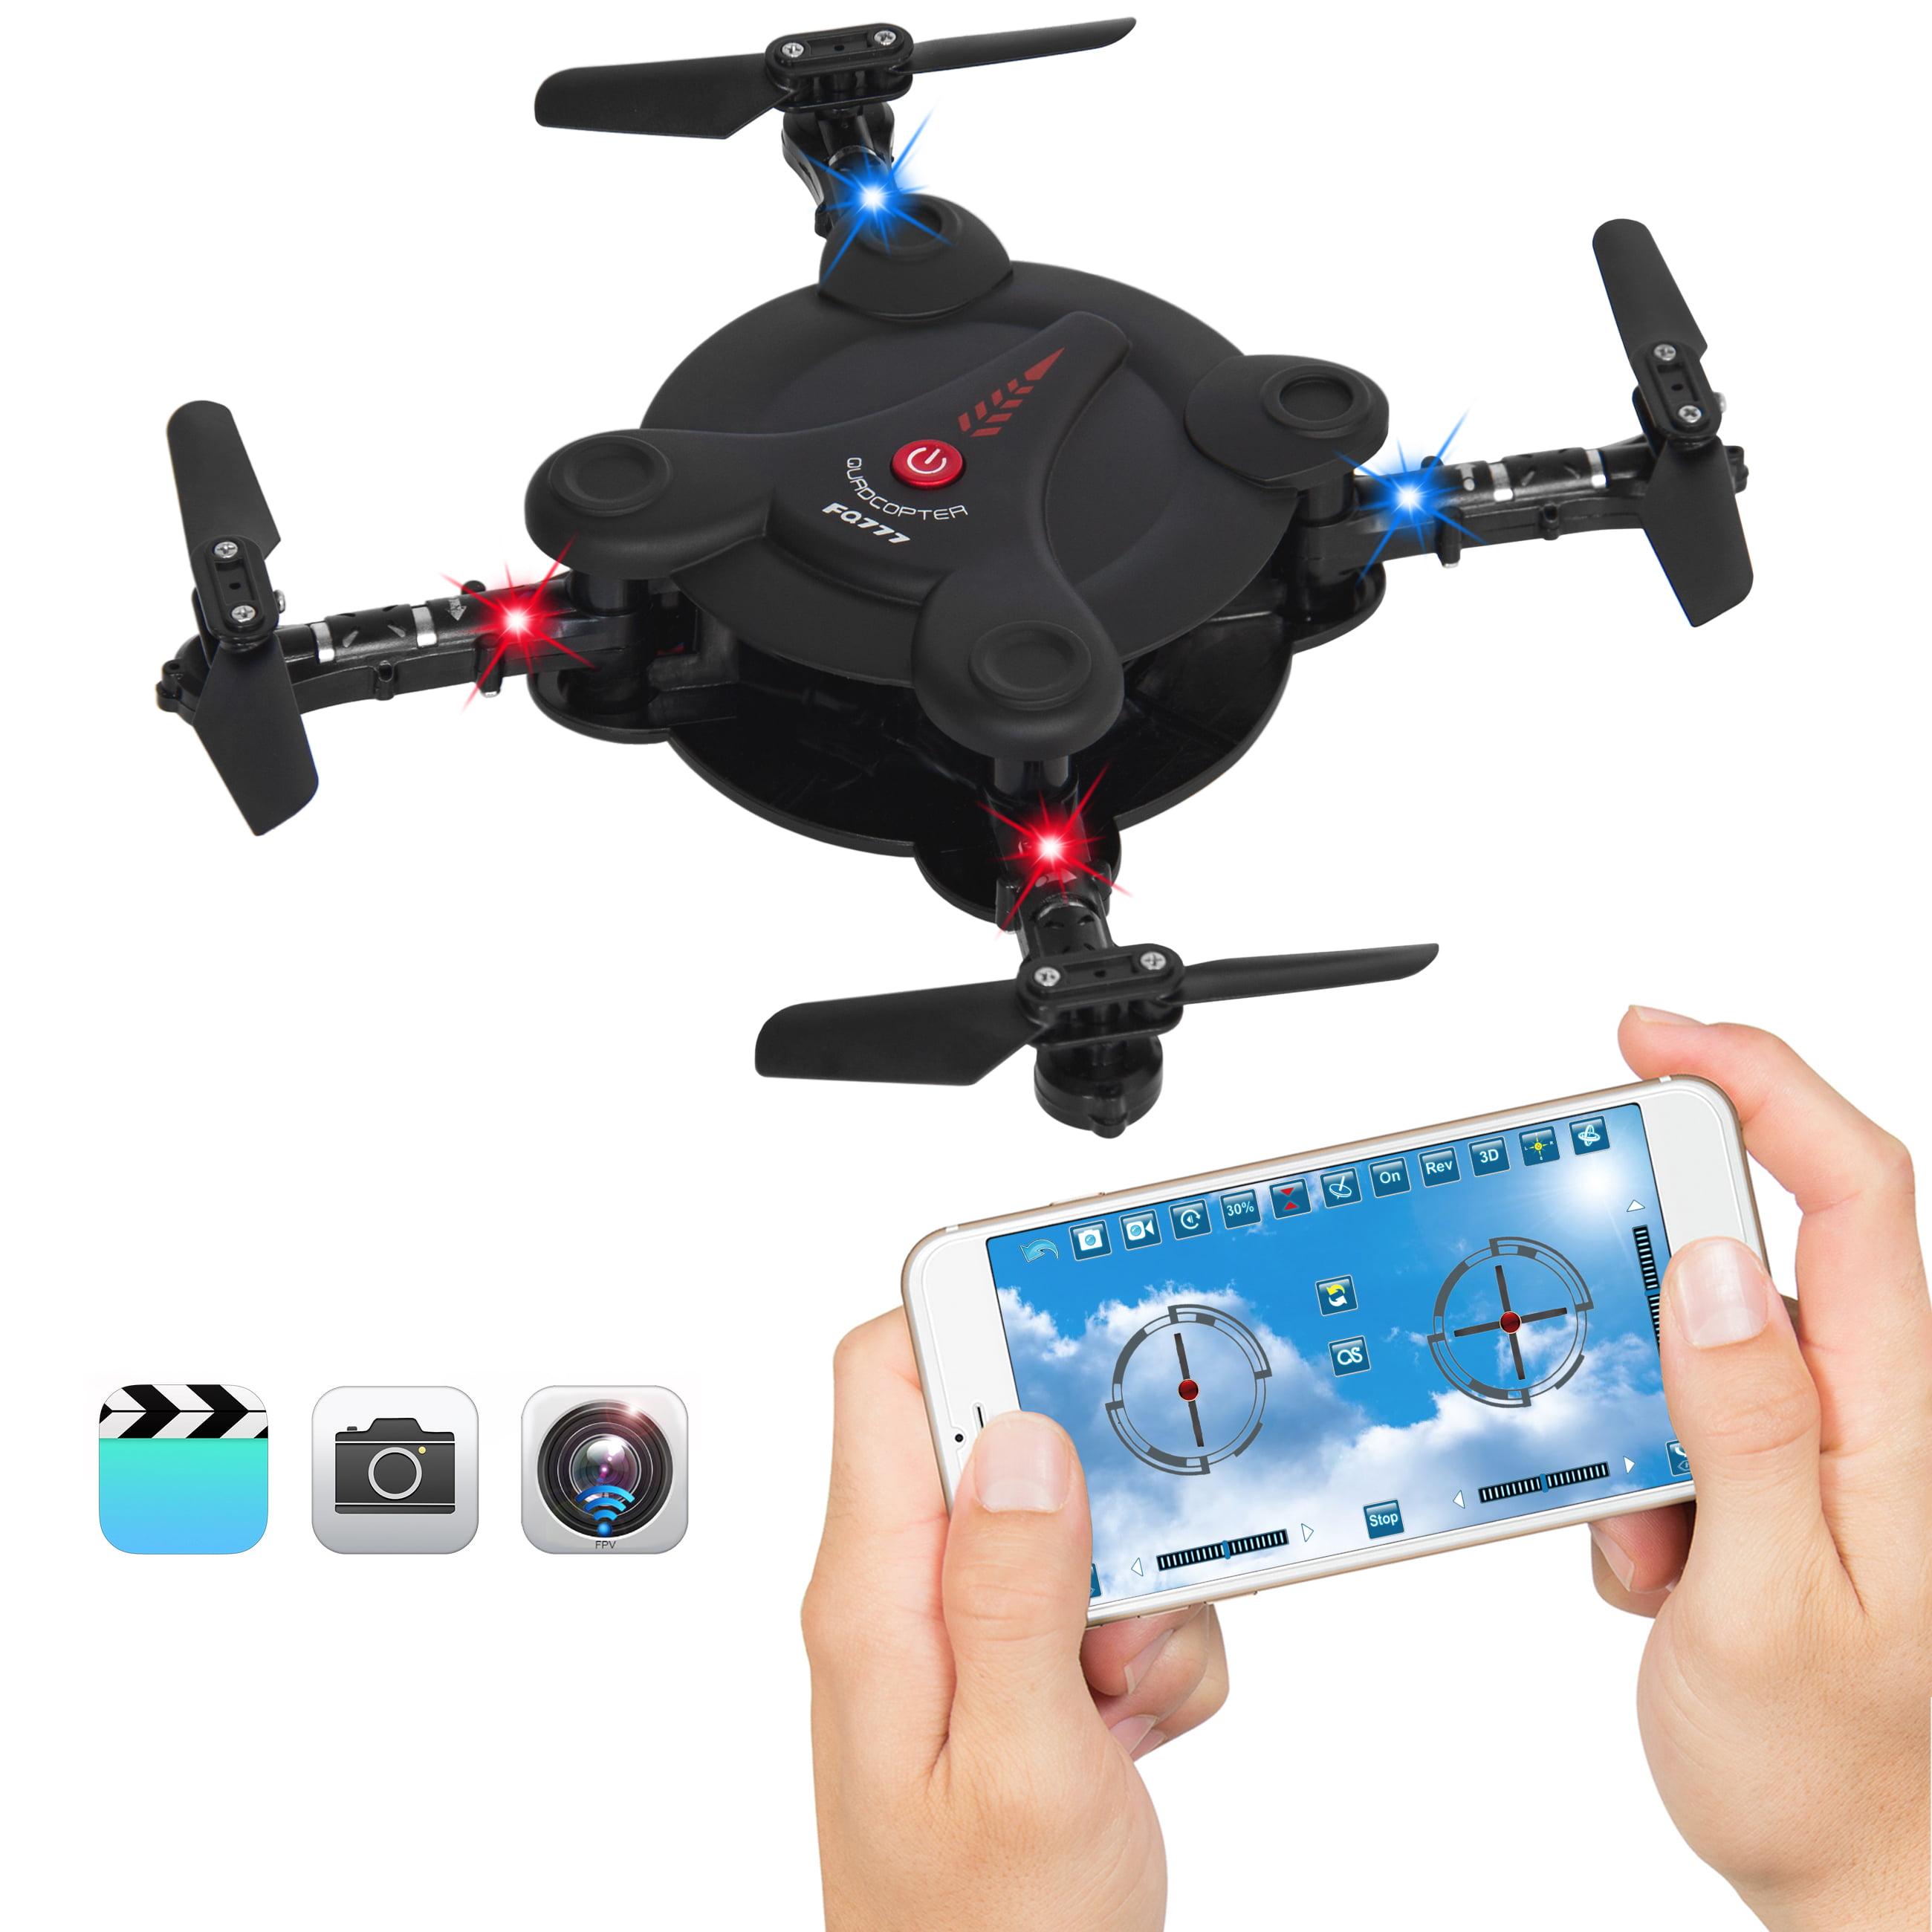 Best Choice Products Smart Phone Control Folding Pocket Mini Drone Gravity Sensor Wifi FPV... by